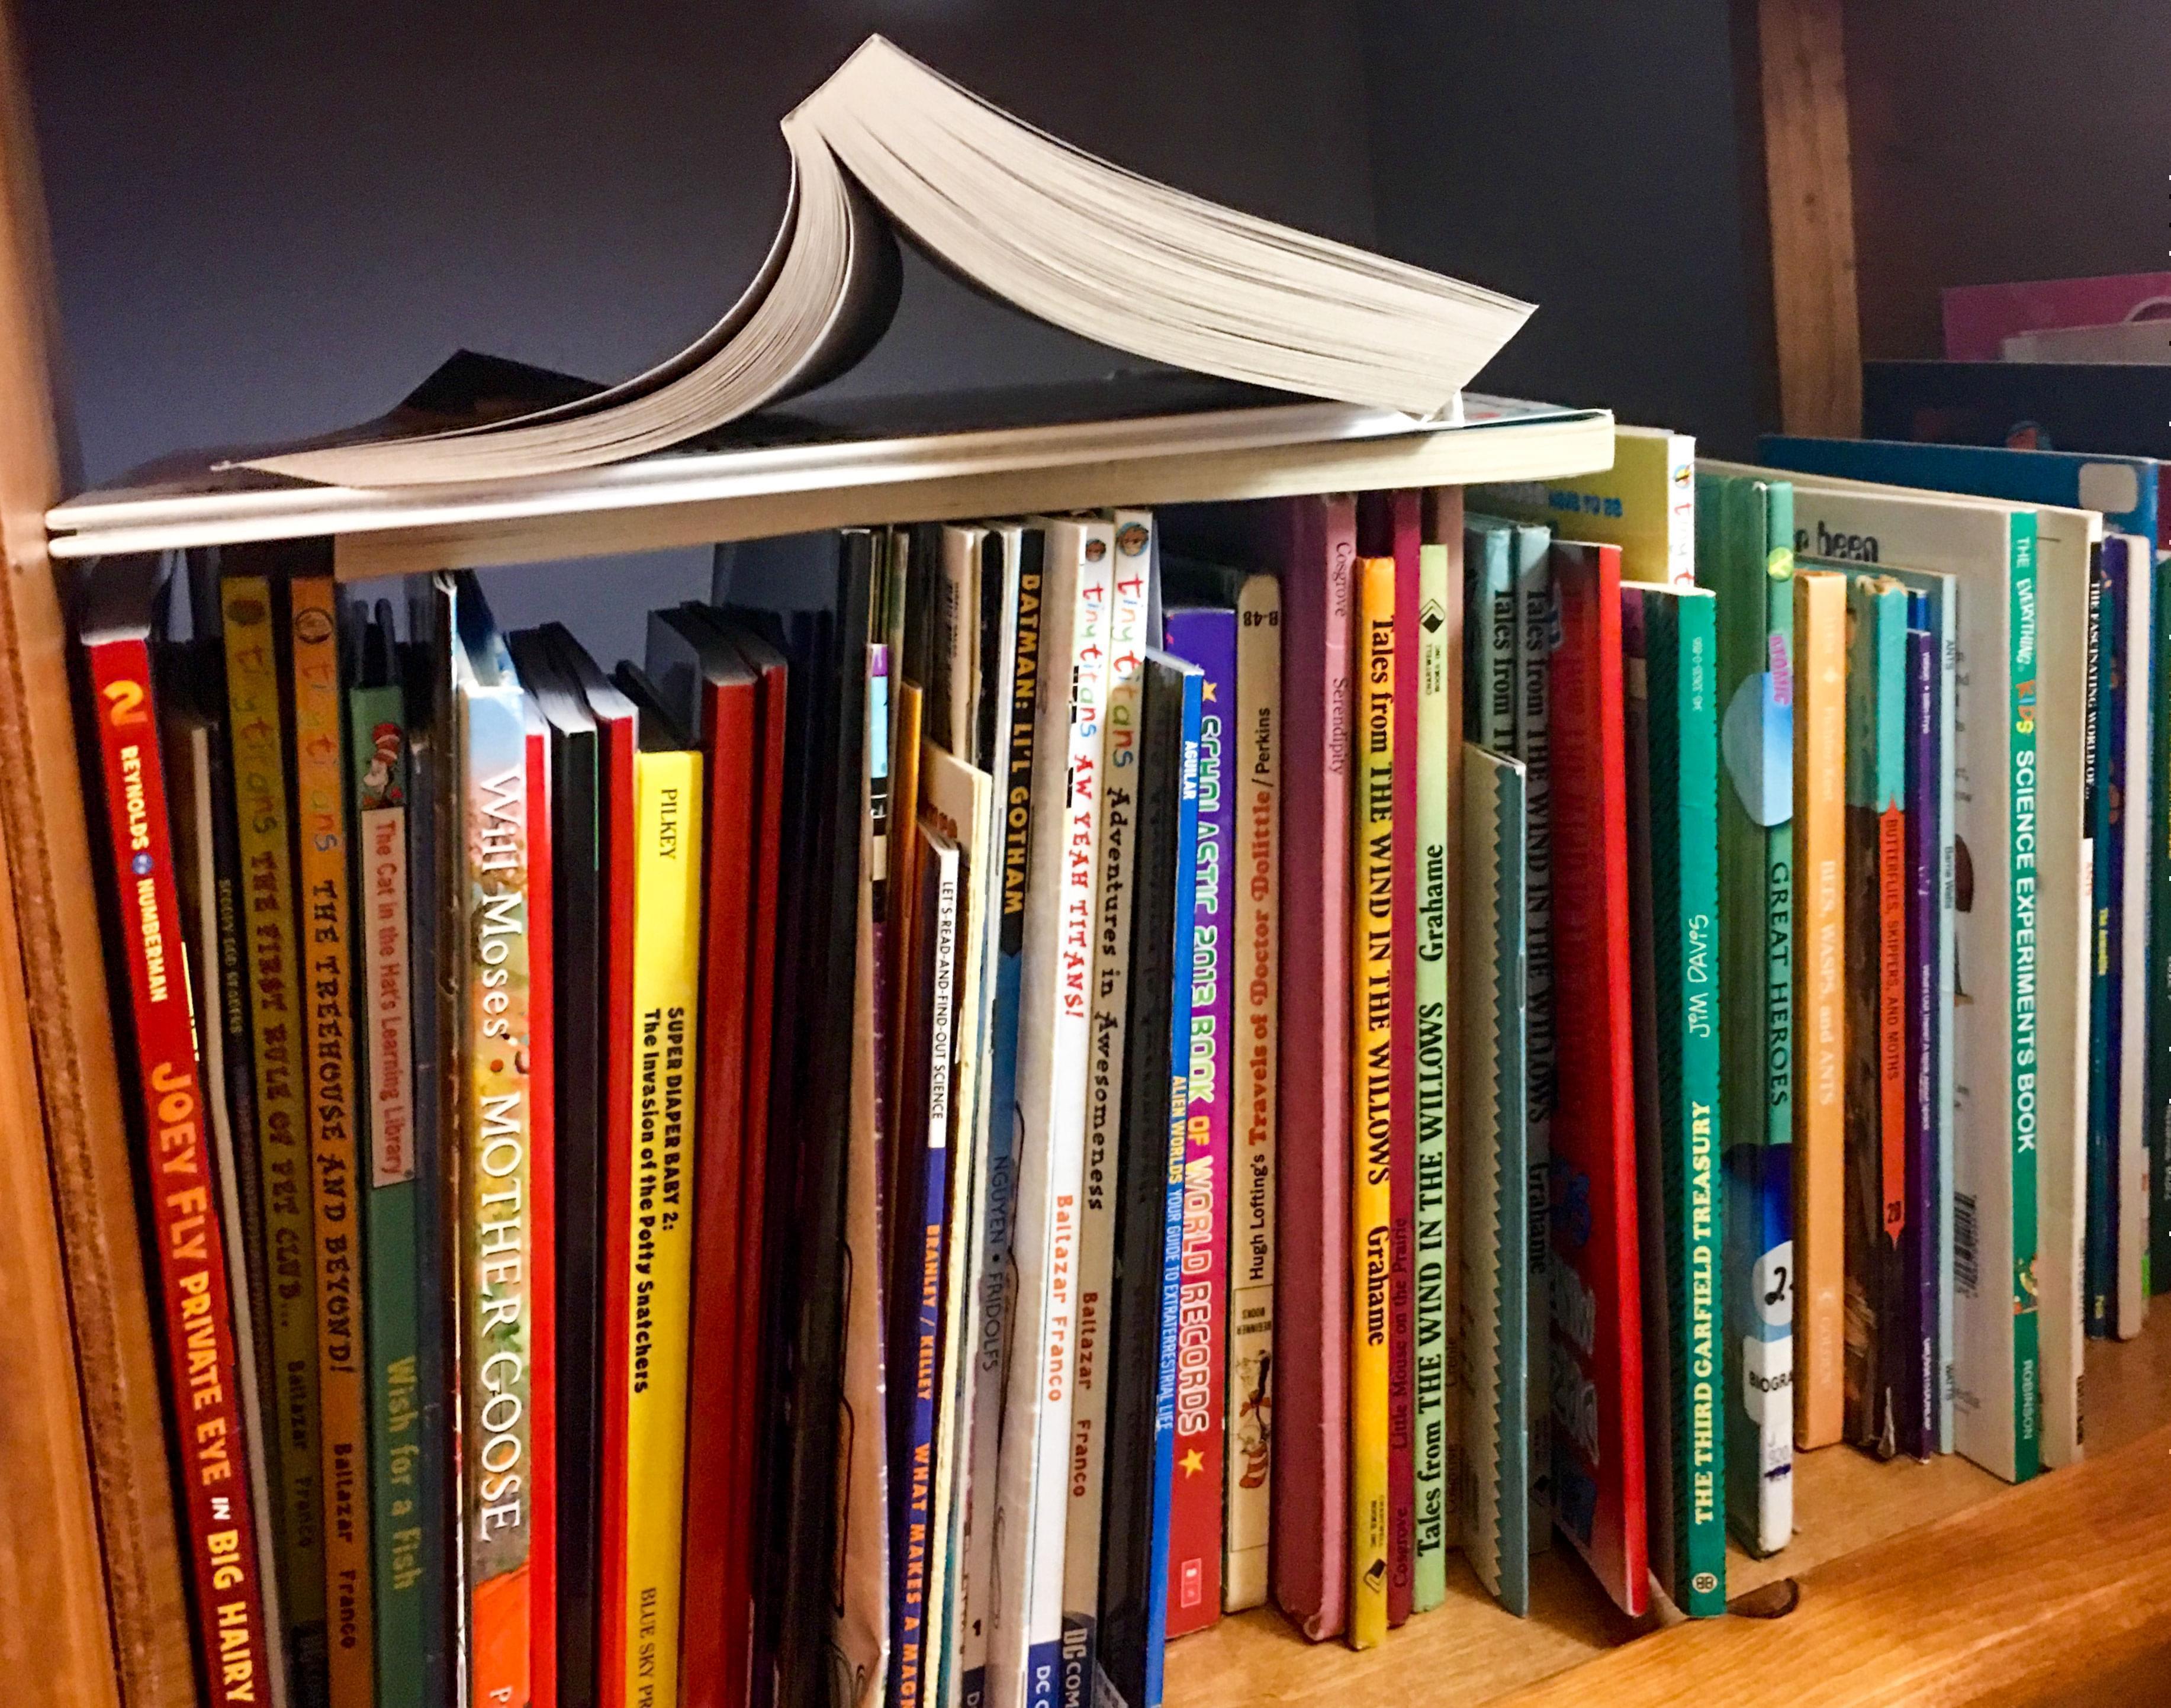 Bookshelf filled with children's books